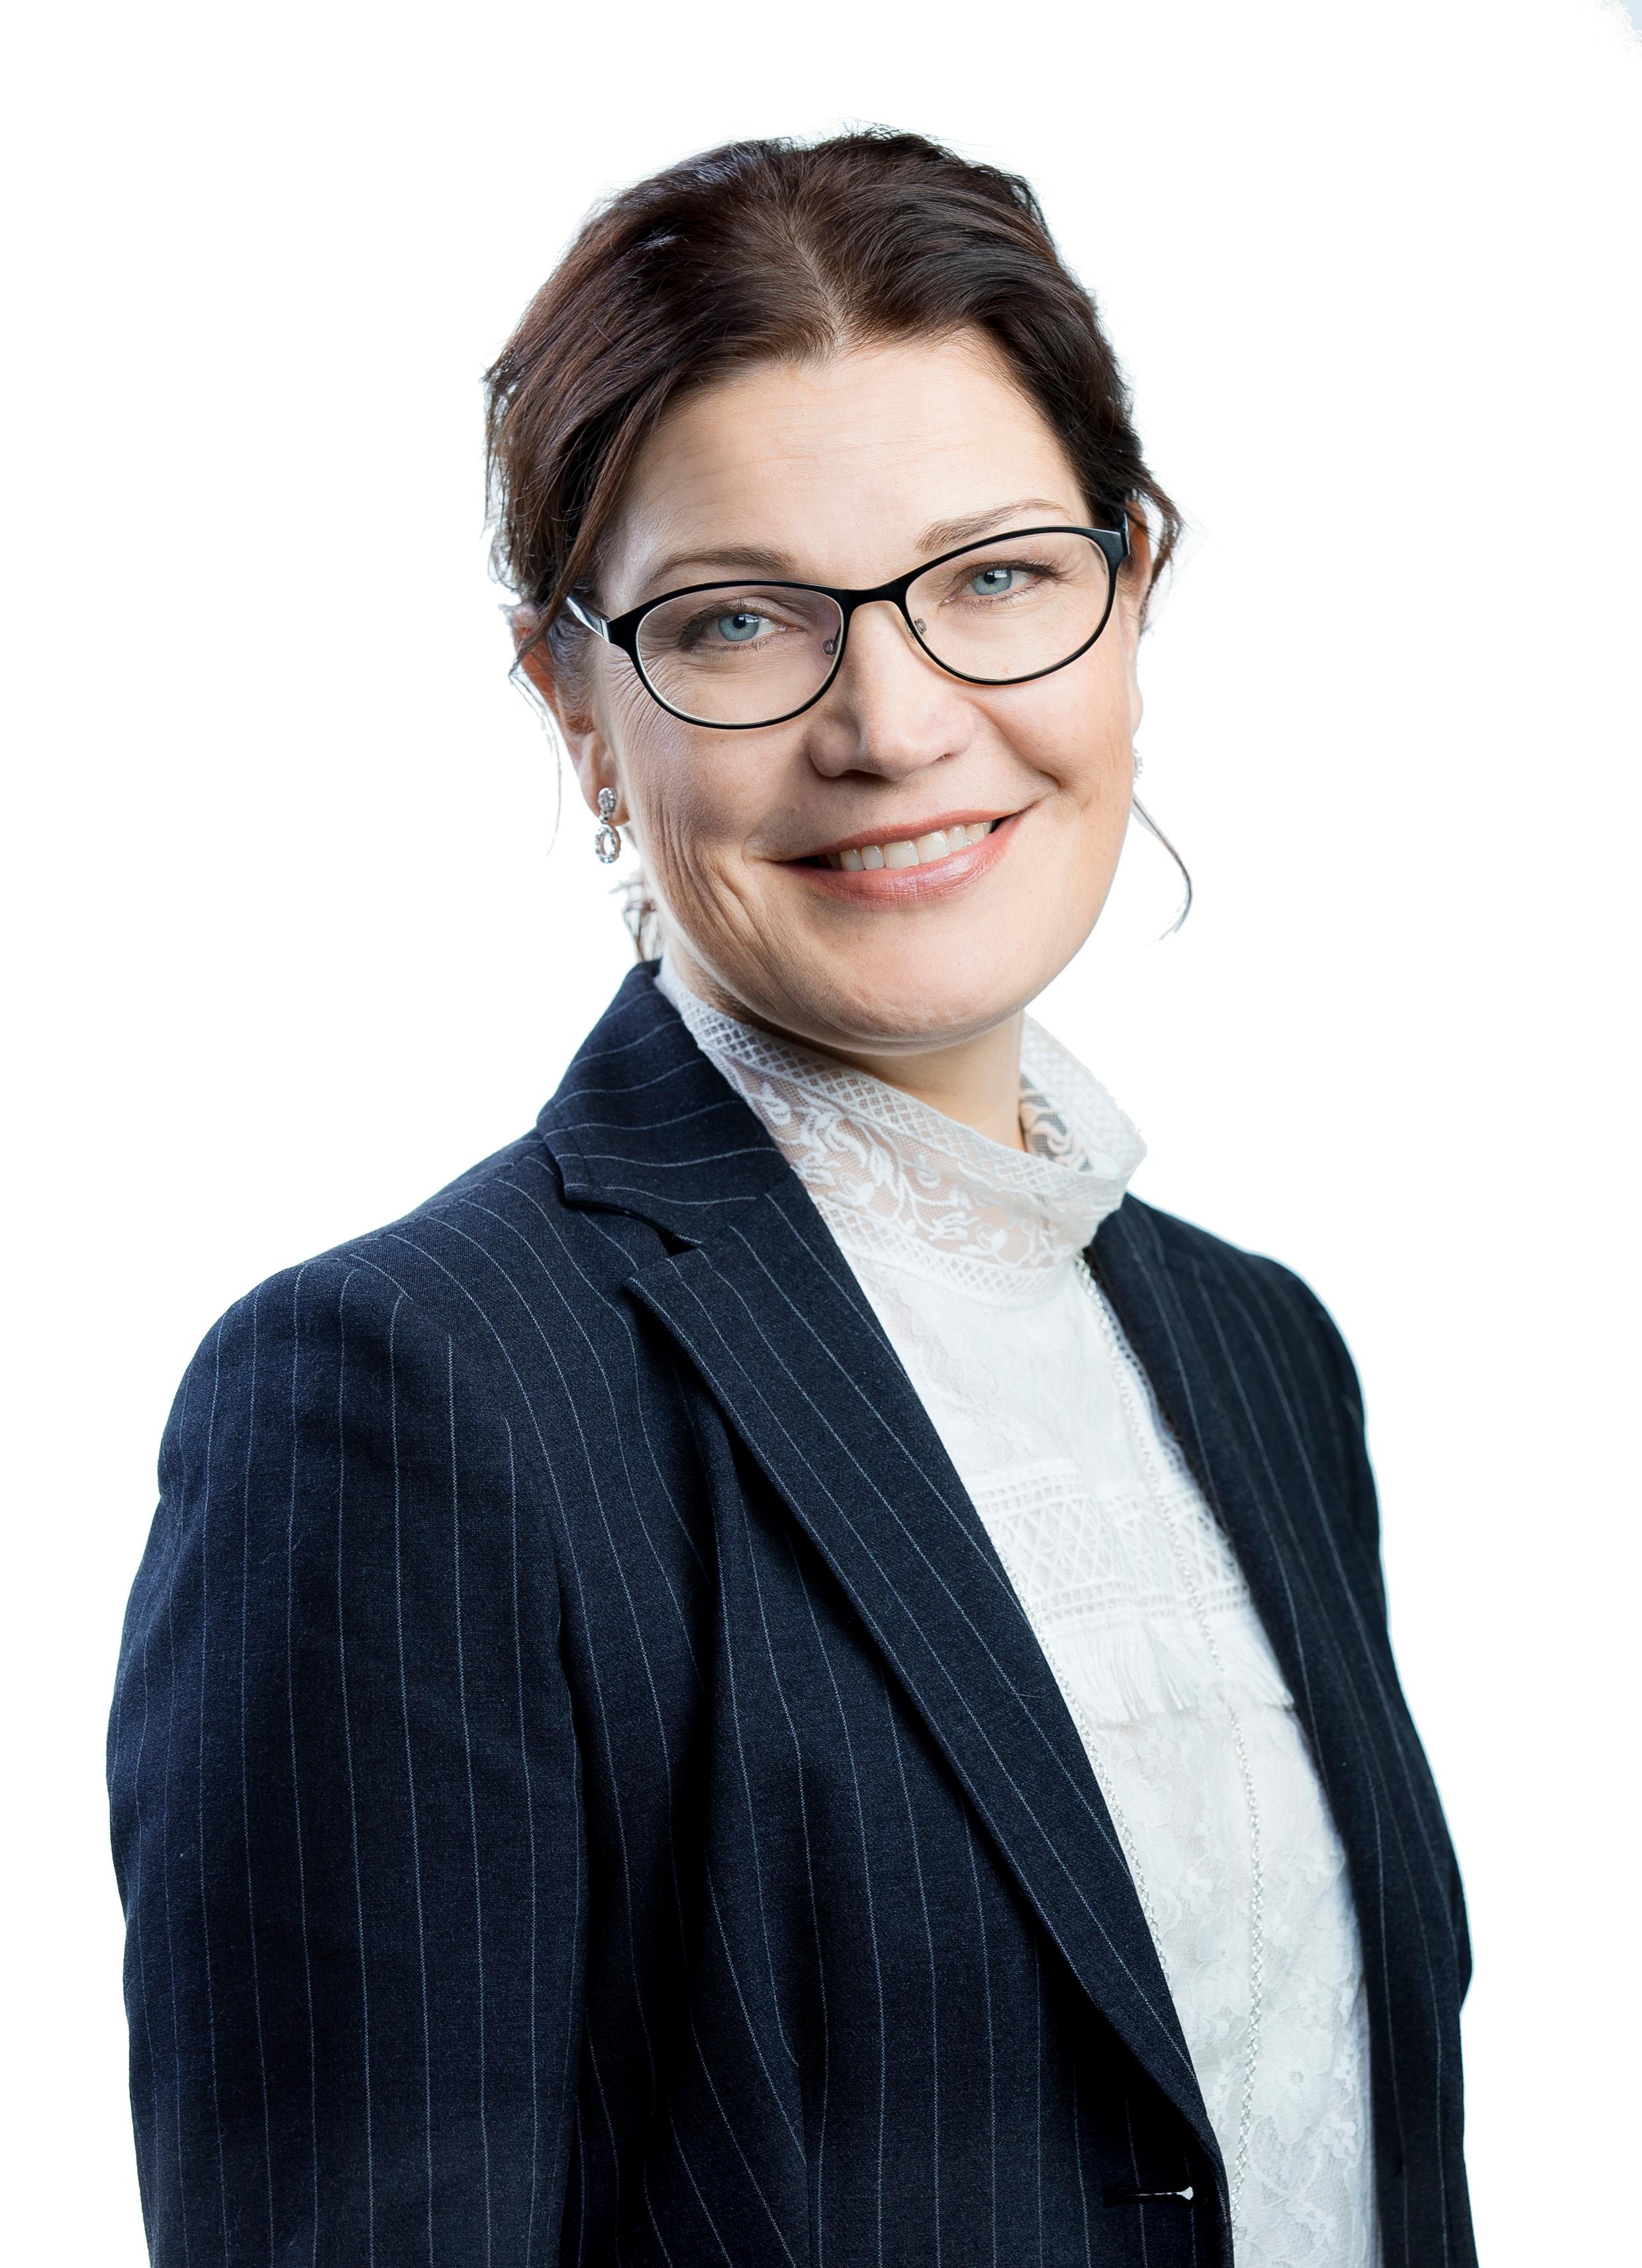 Henriikka Åkerman